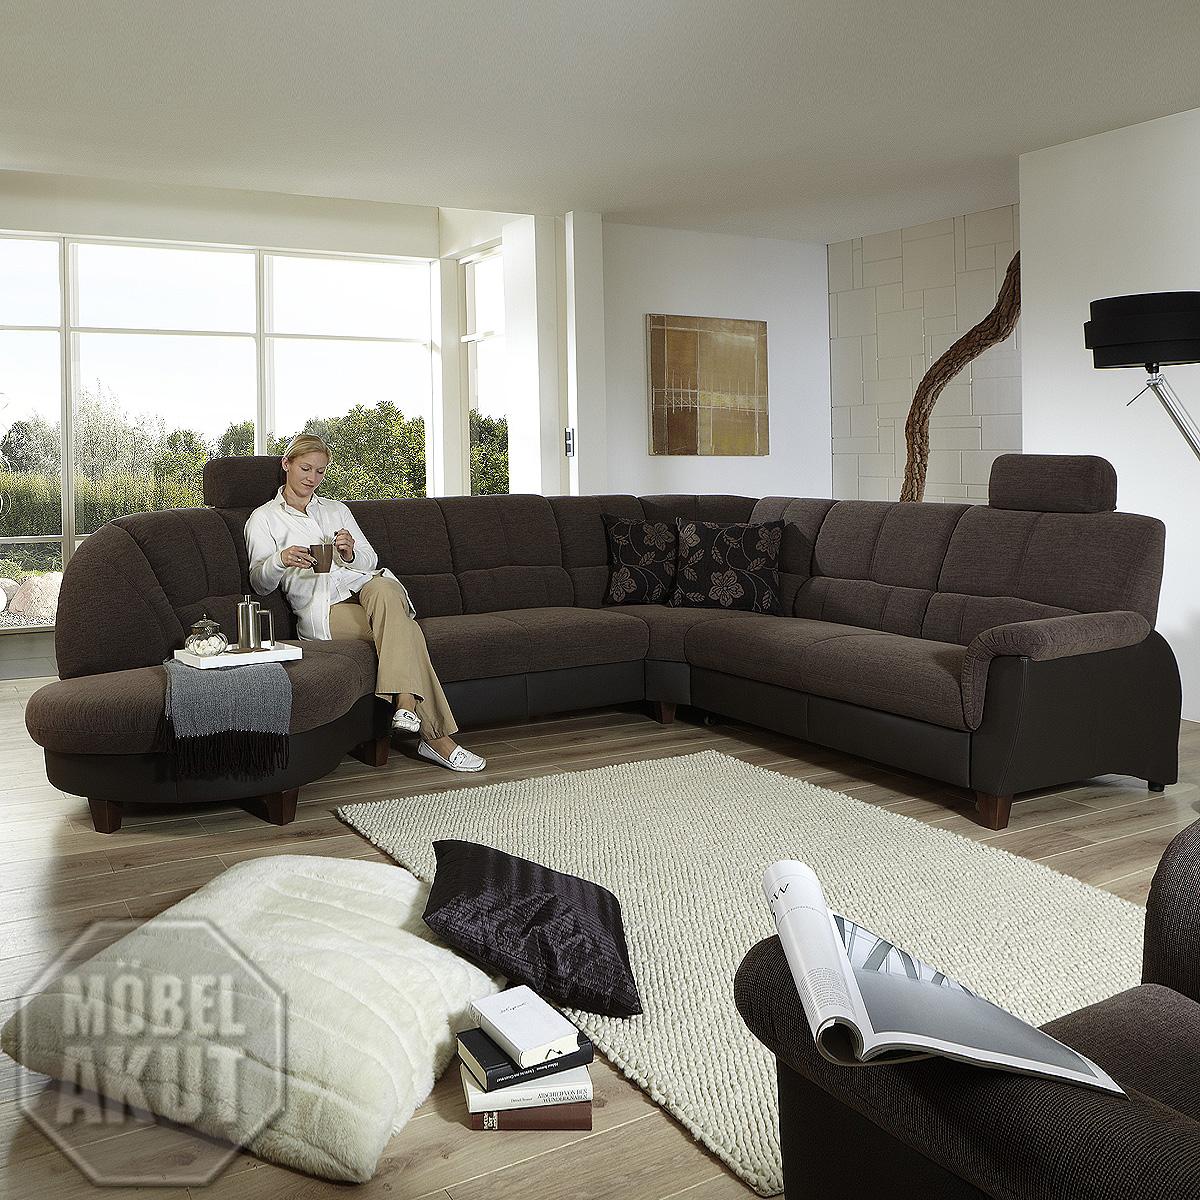 wohnlandschaft ferrara eck garnitur sofa stoff lederlook schoko ebay. Black Bedroom Furniture Sets. Home Design Ideas